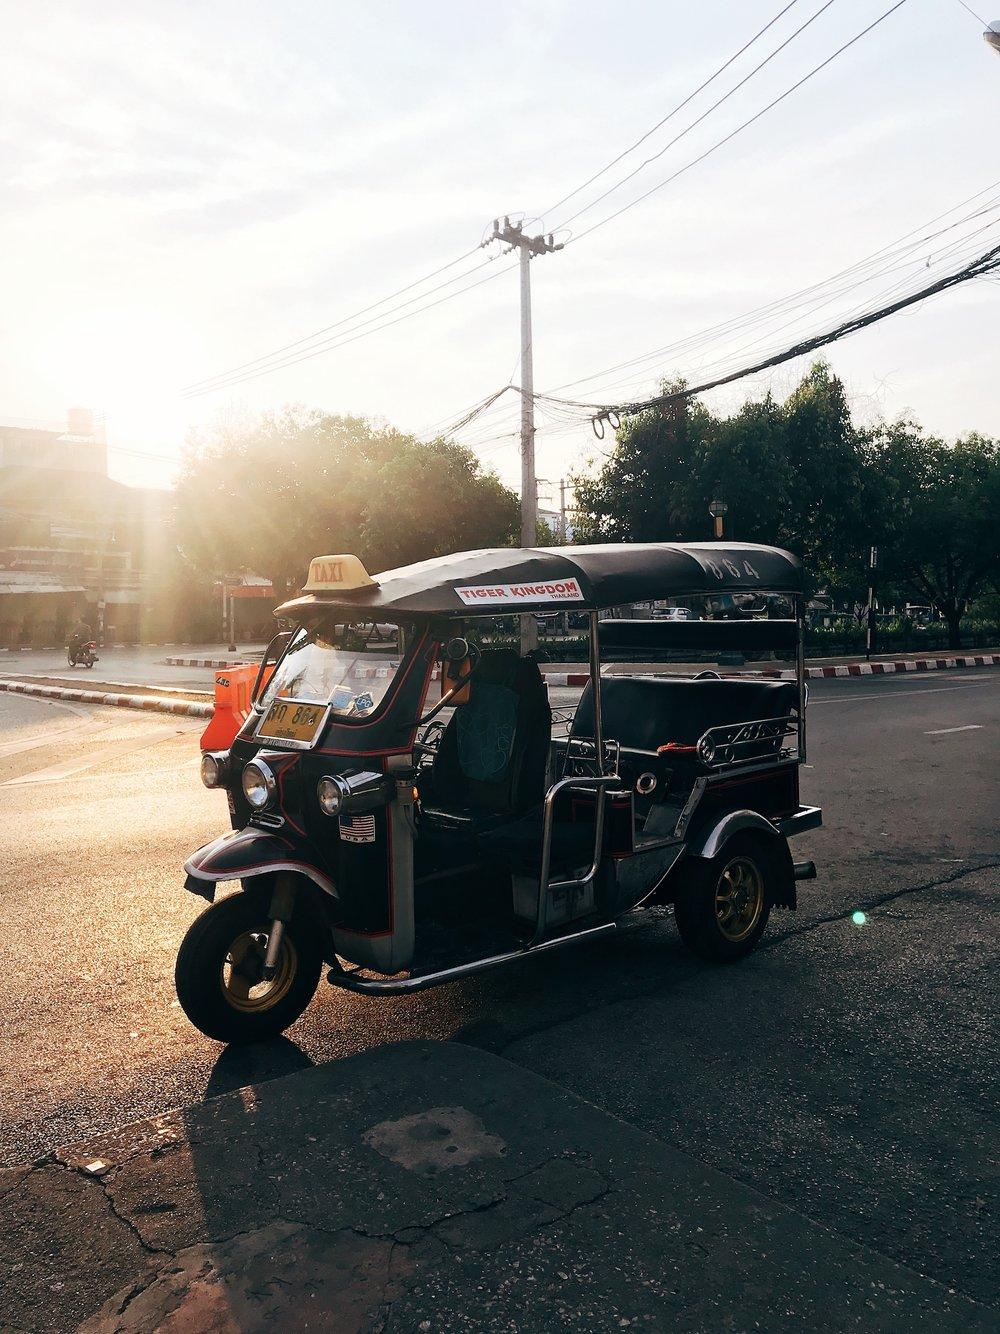 Chiang Mai Thailand Travel Guide - Claire Eliza 25.JPG